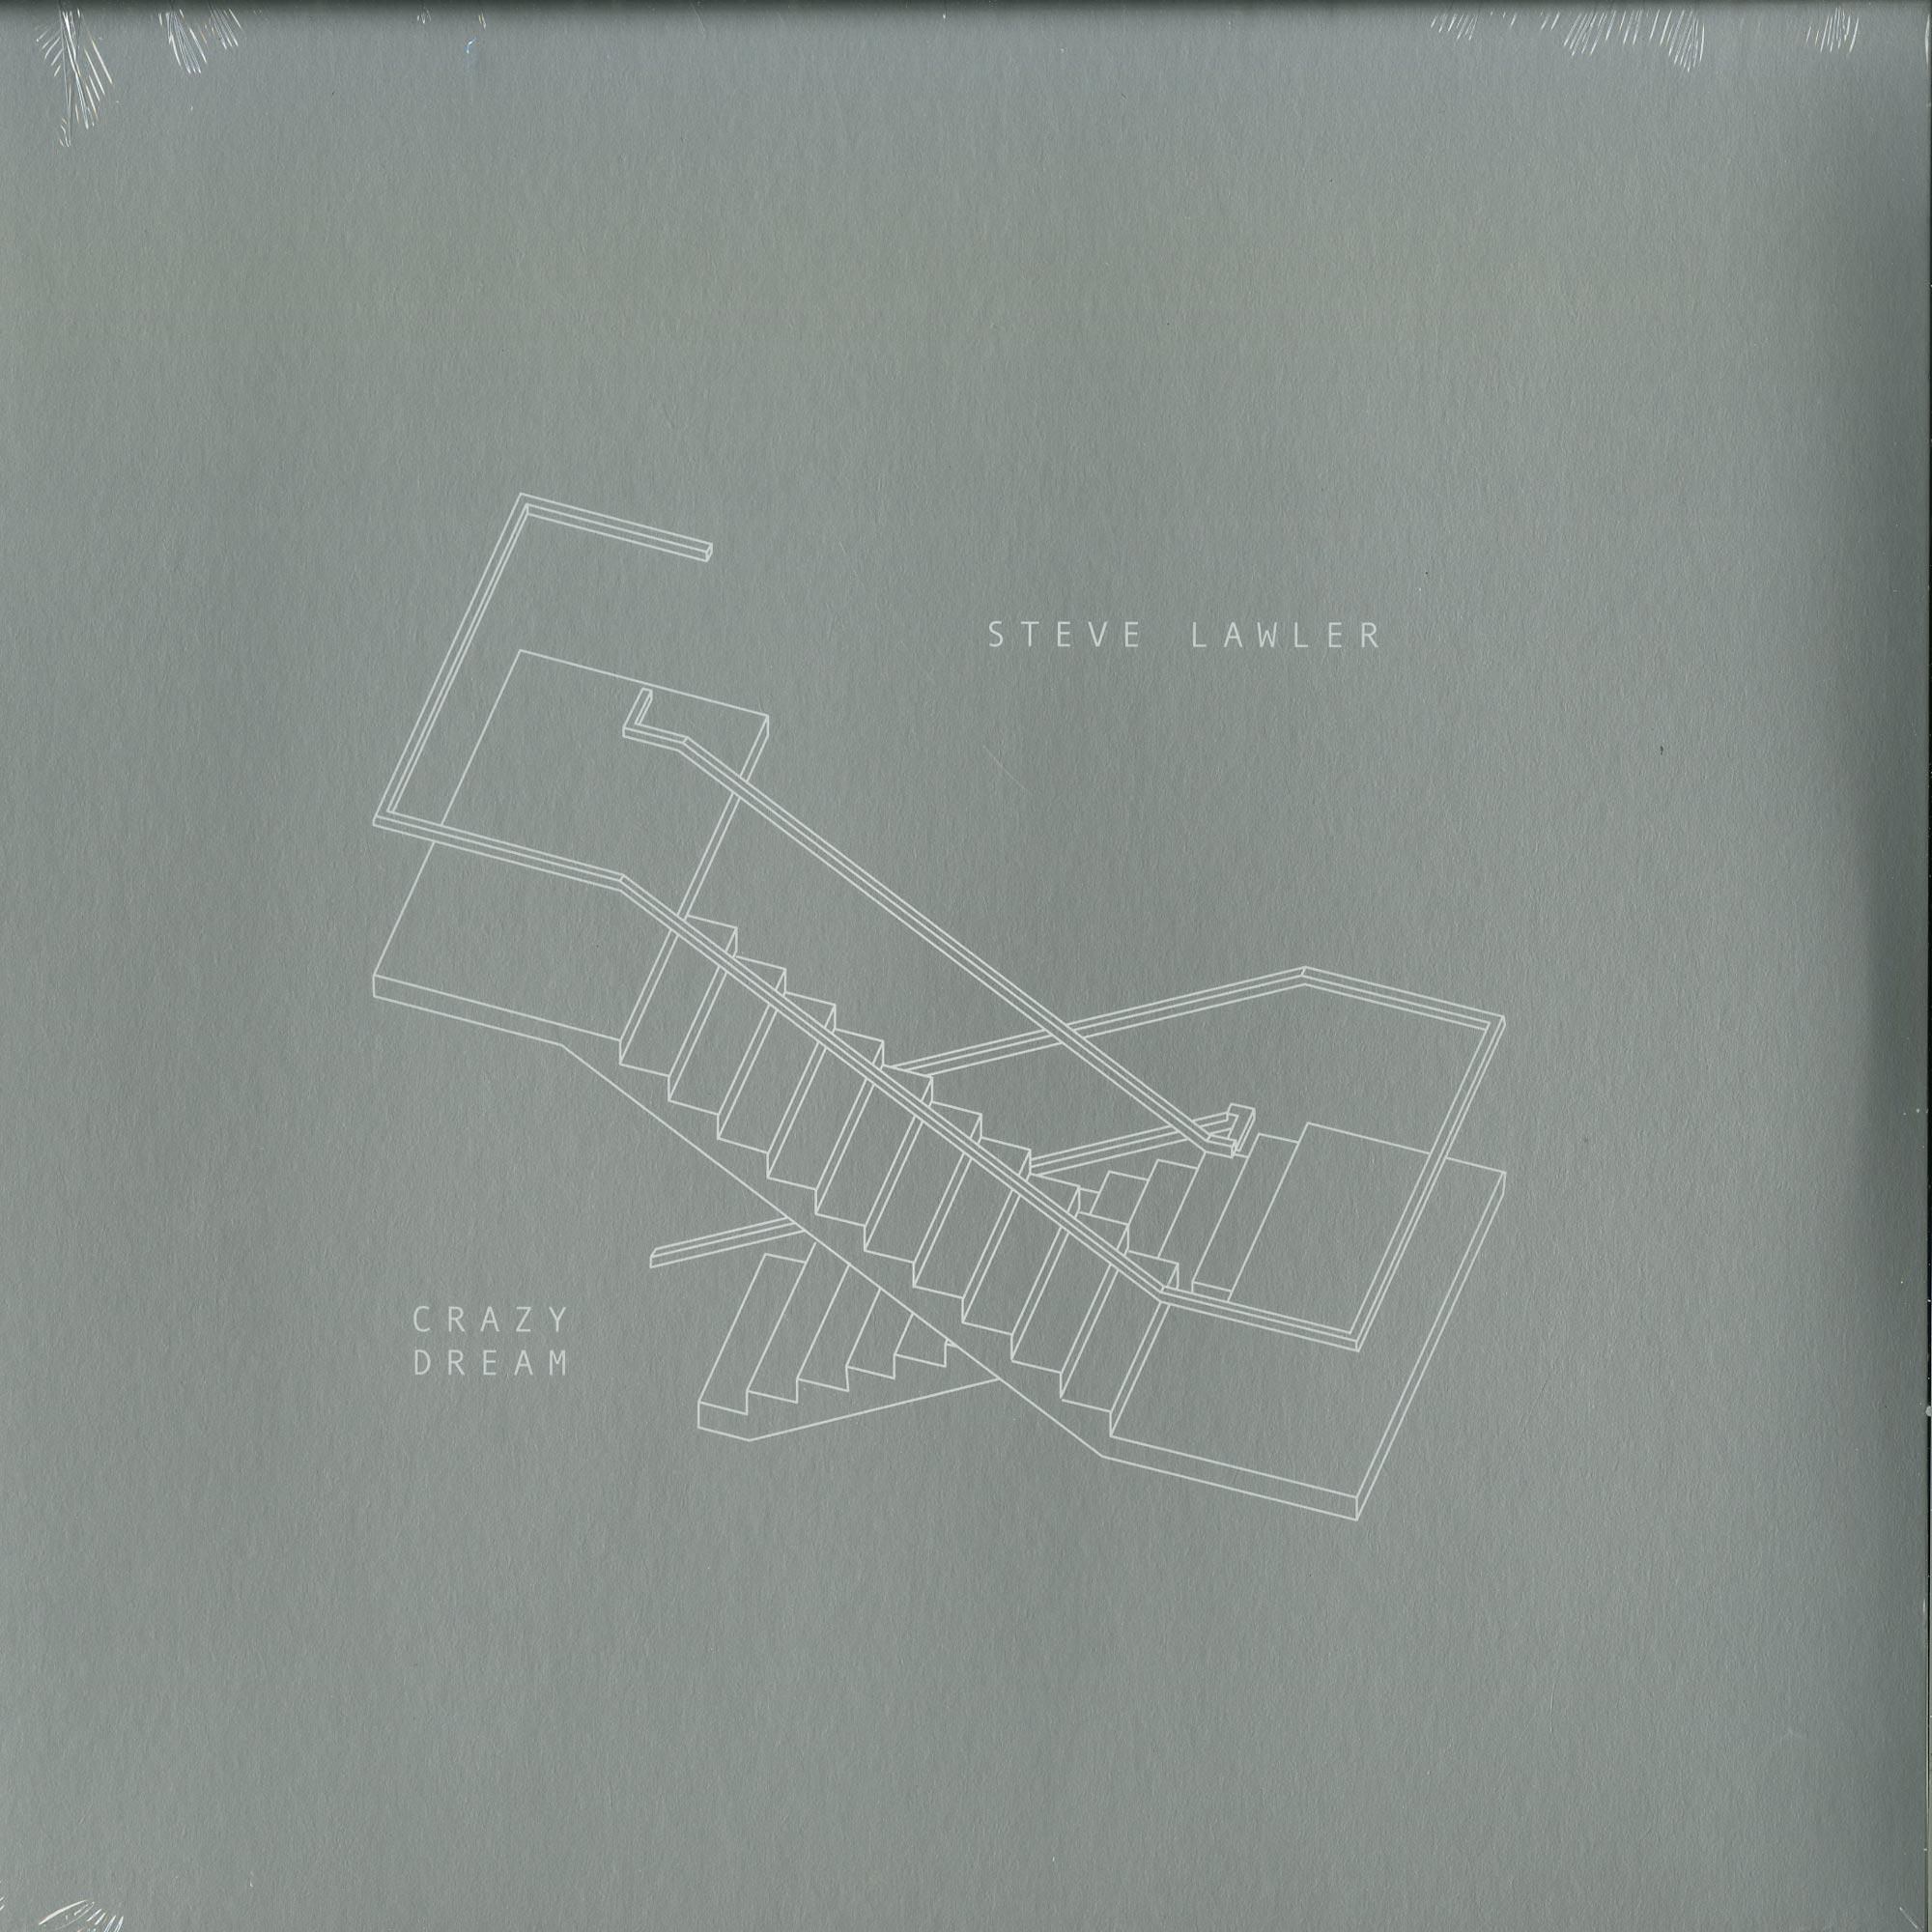 Steve Lawler - CRAZY DREAM